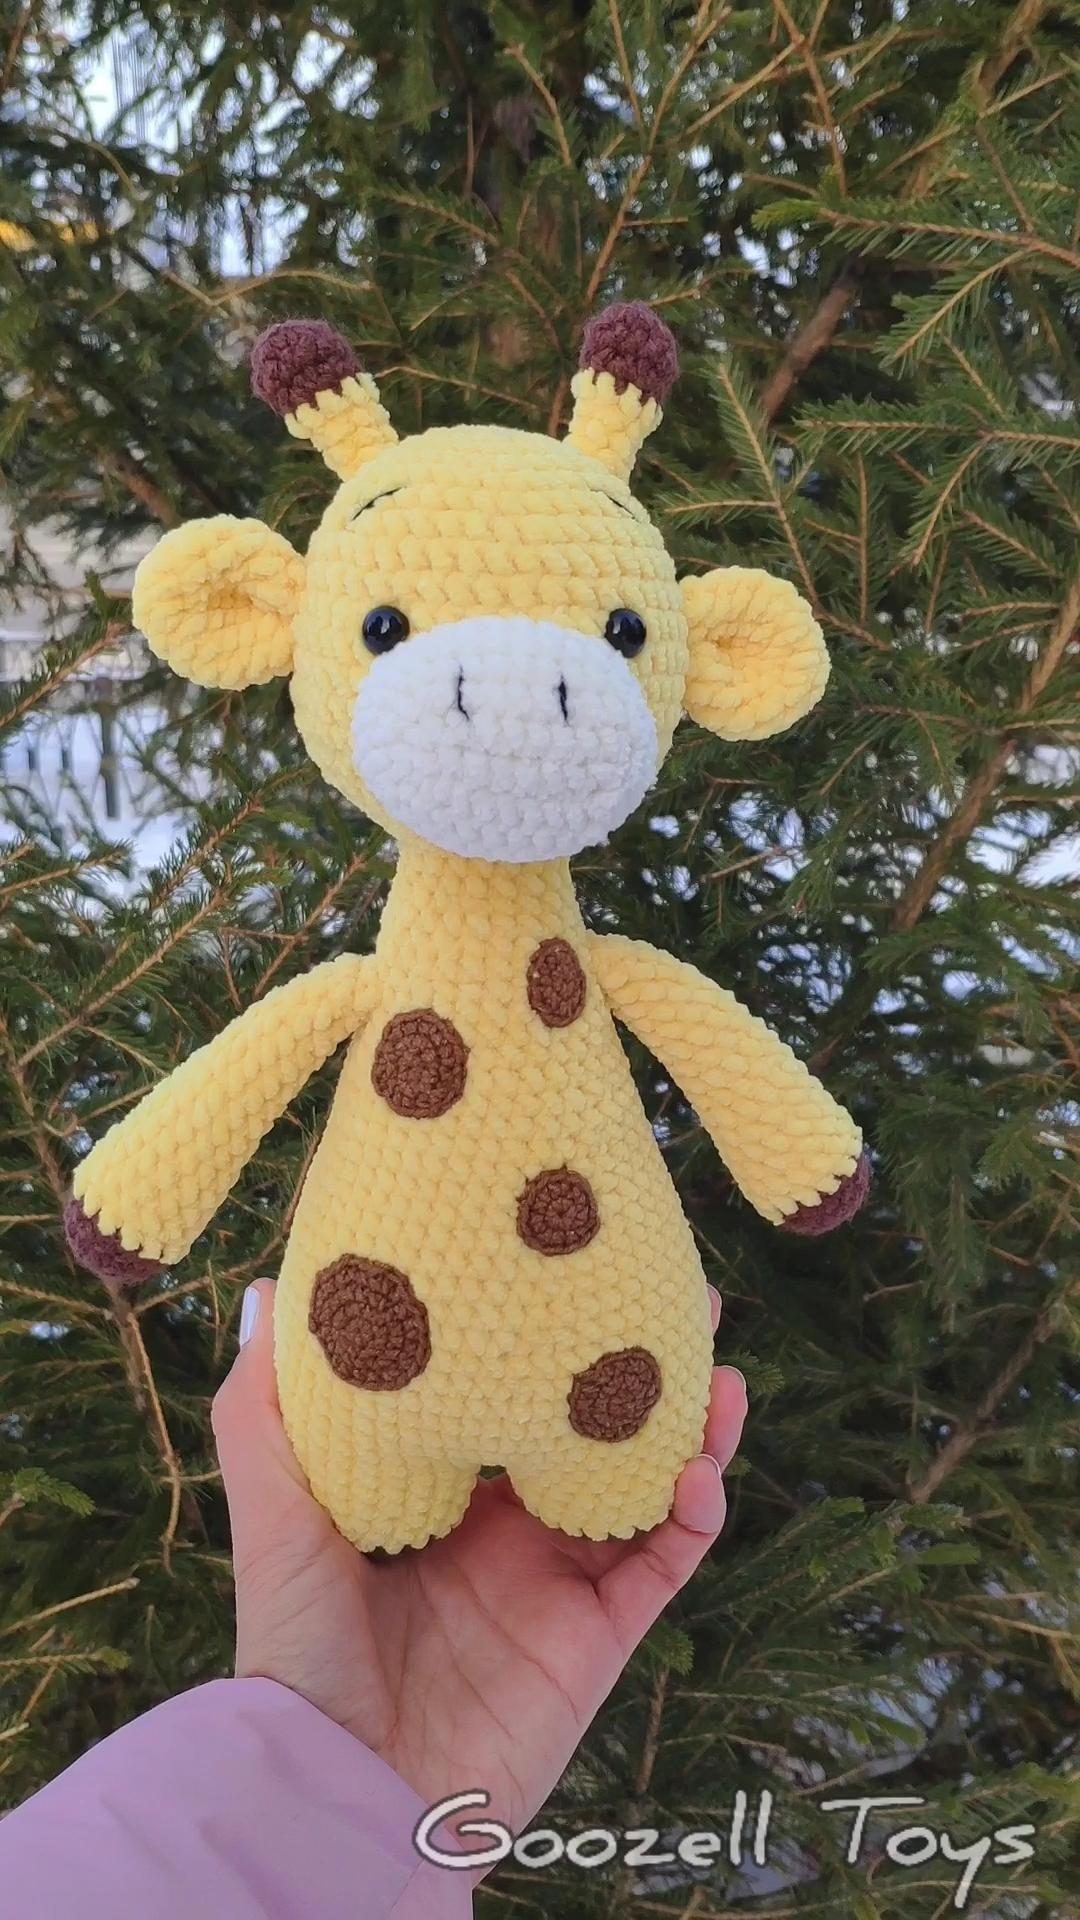 CROCHET GIRAFFE PATTERN - Amigurumi Plush Giraffe pattern - Knit Stuffed Toys - Crochet animal